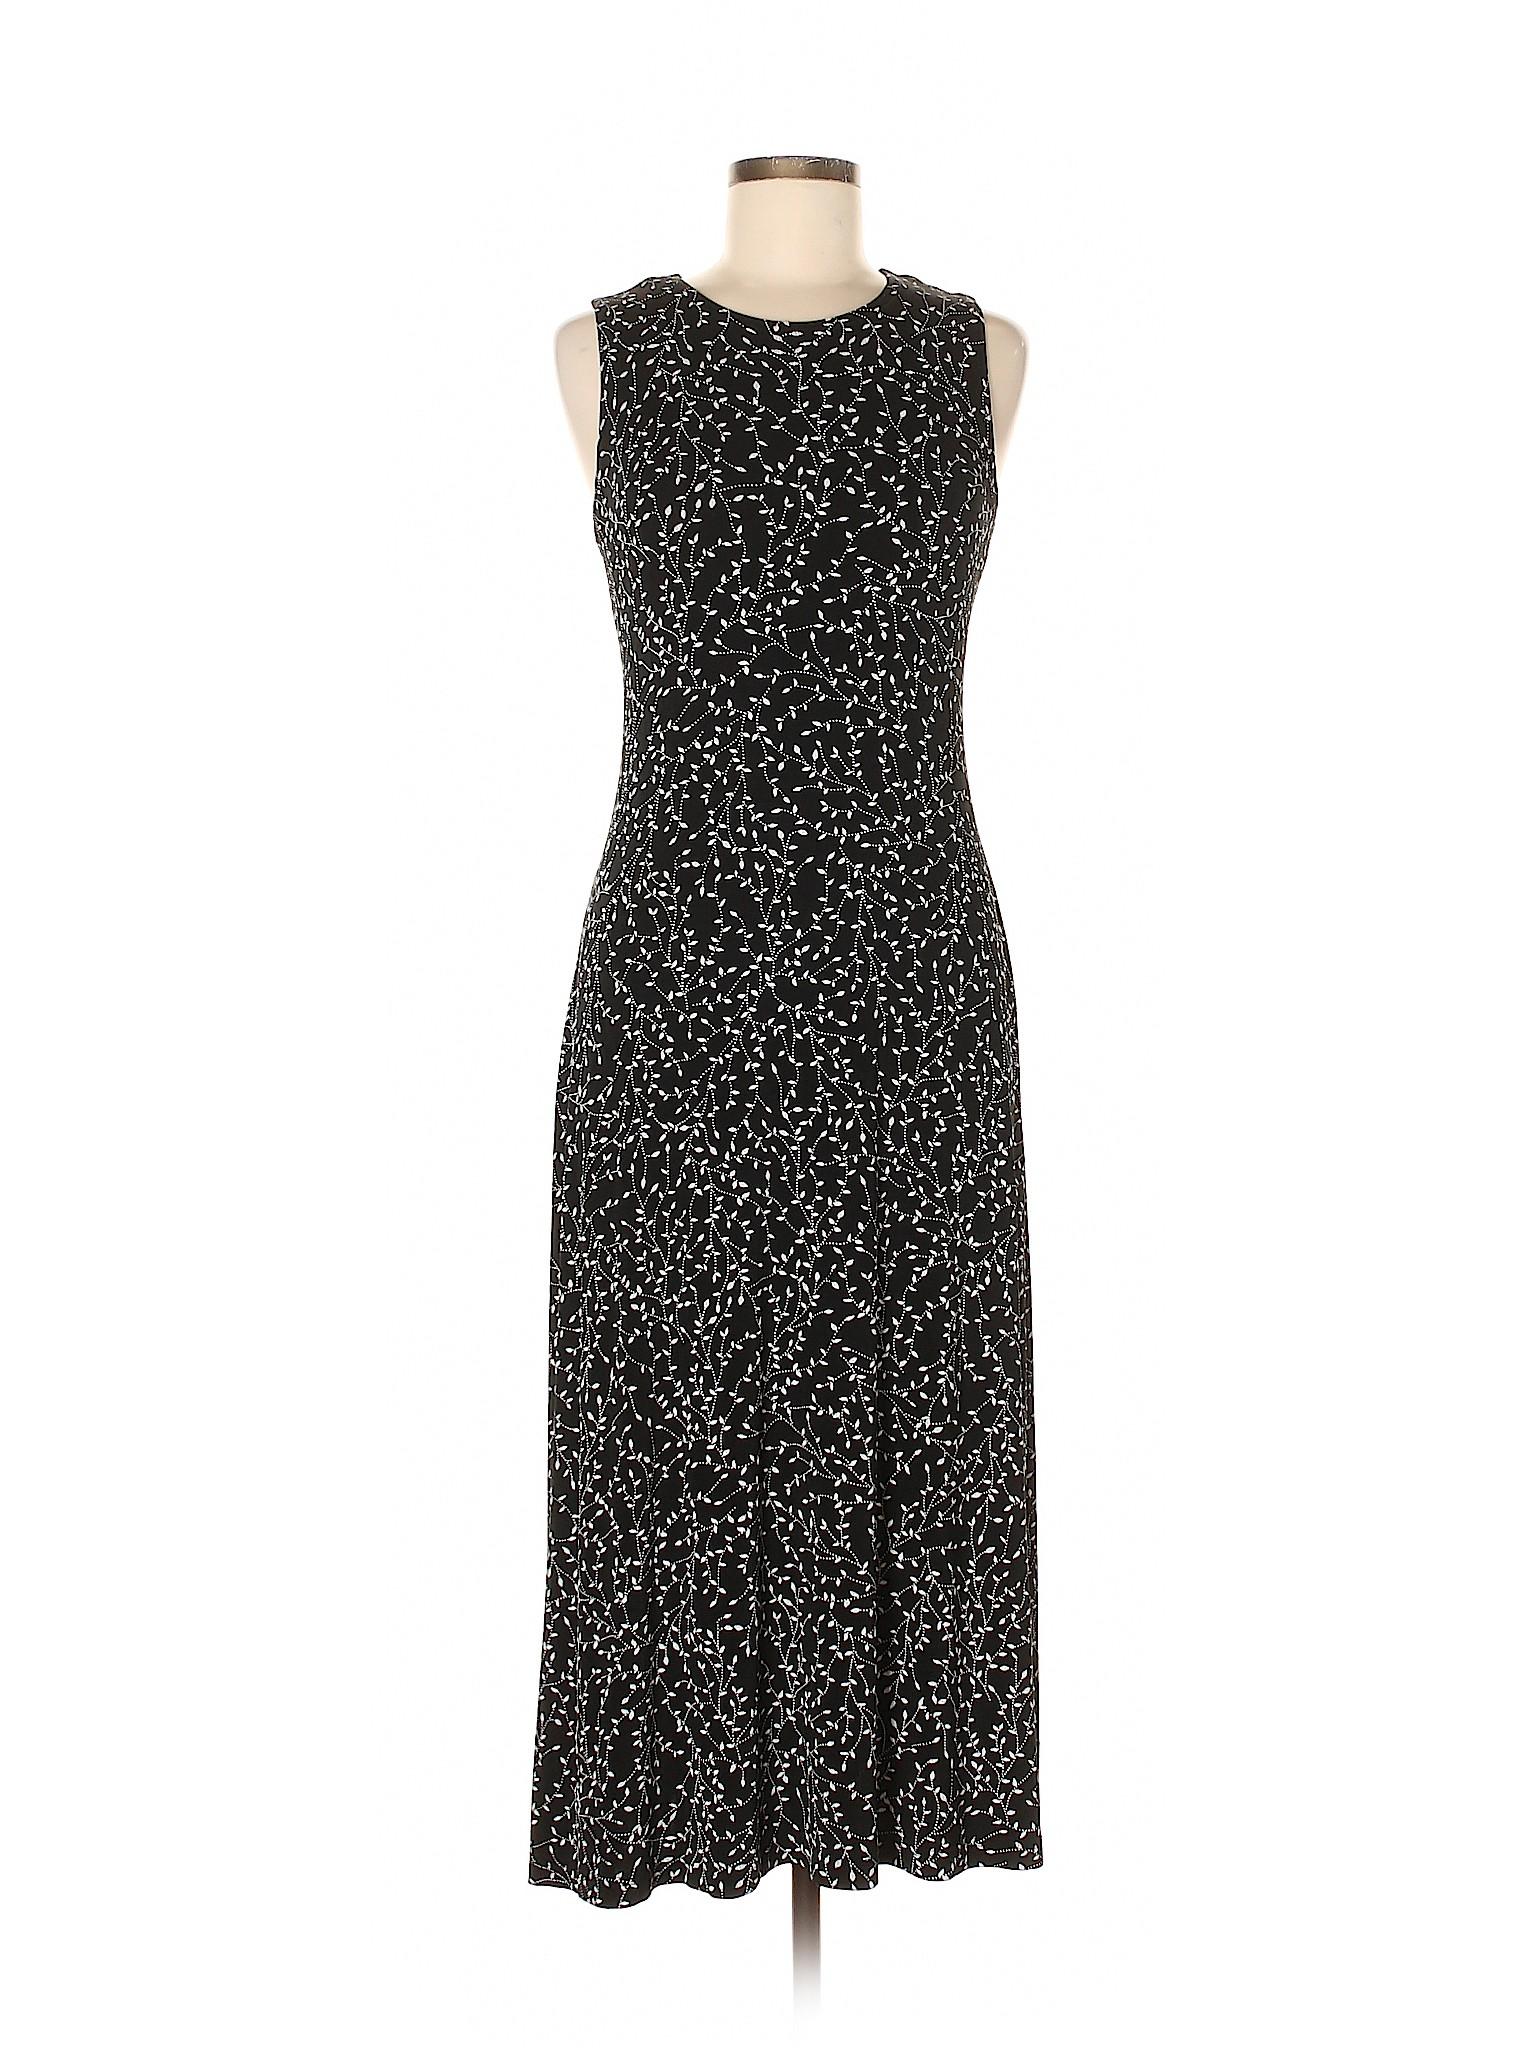 775face82a40 Details about Ronni Nicole Women Black Casual Dress 8 Petite